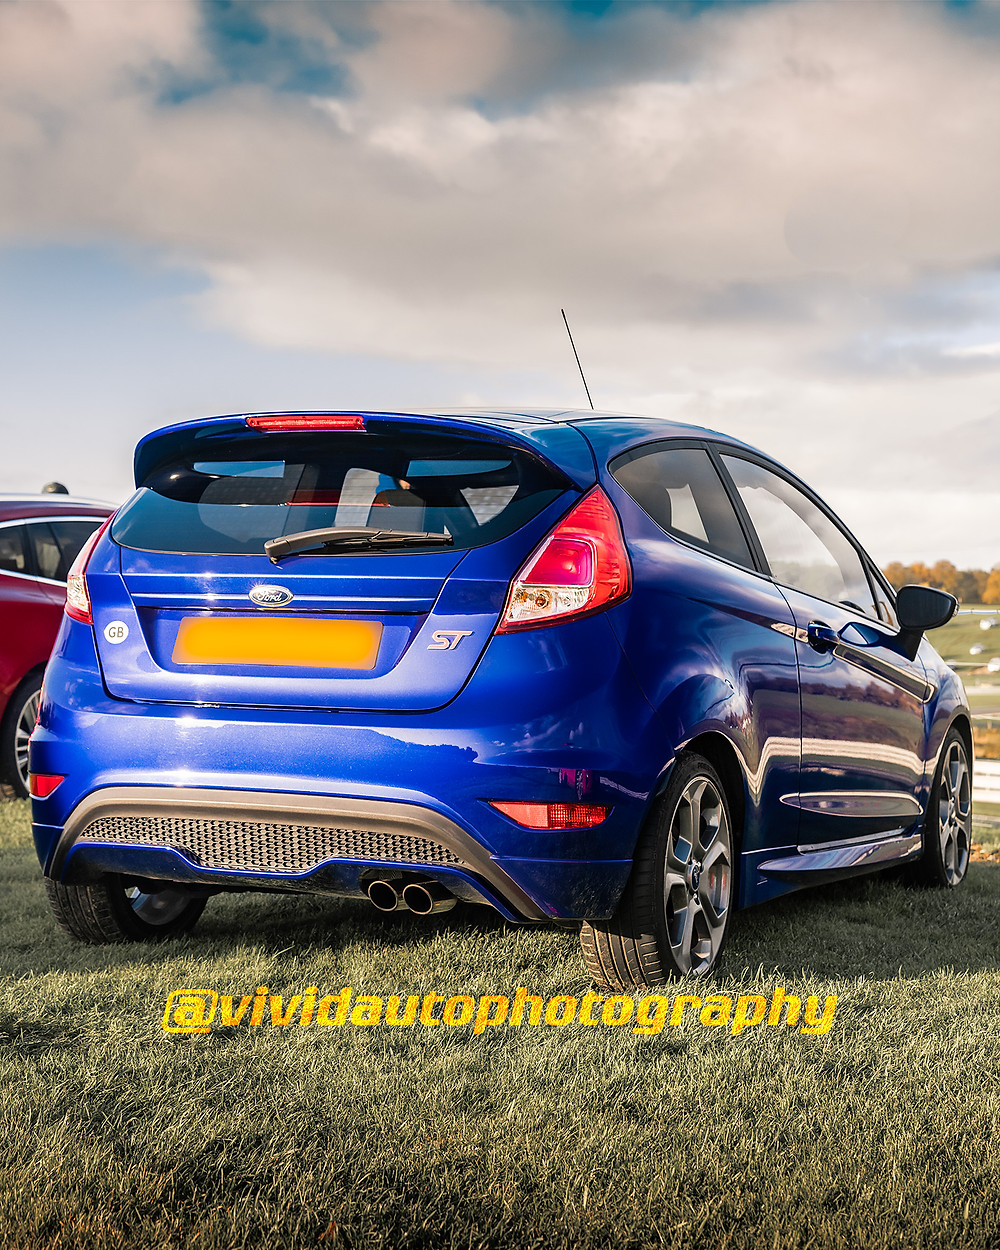 Ford Fiesta ST MK7 | Sprit Blue | Oulton Park